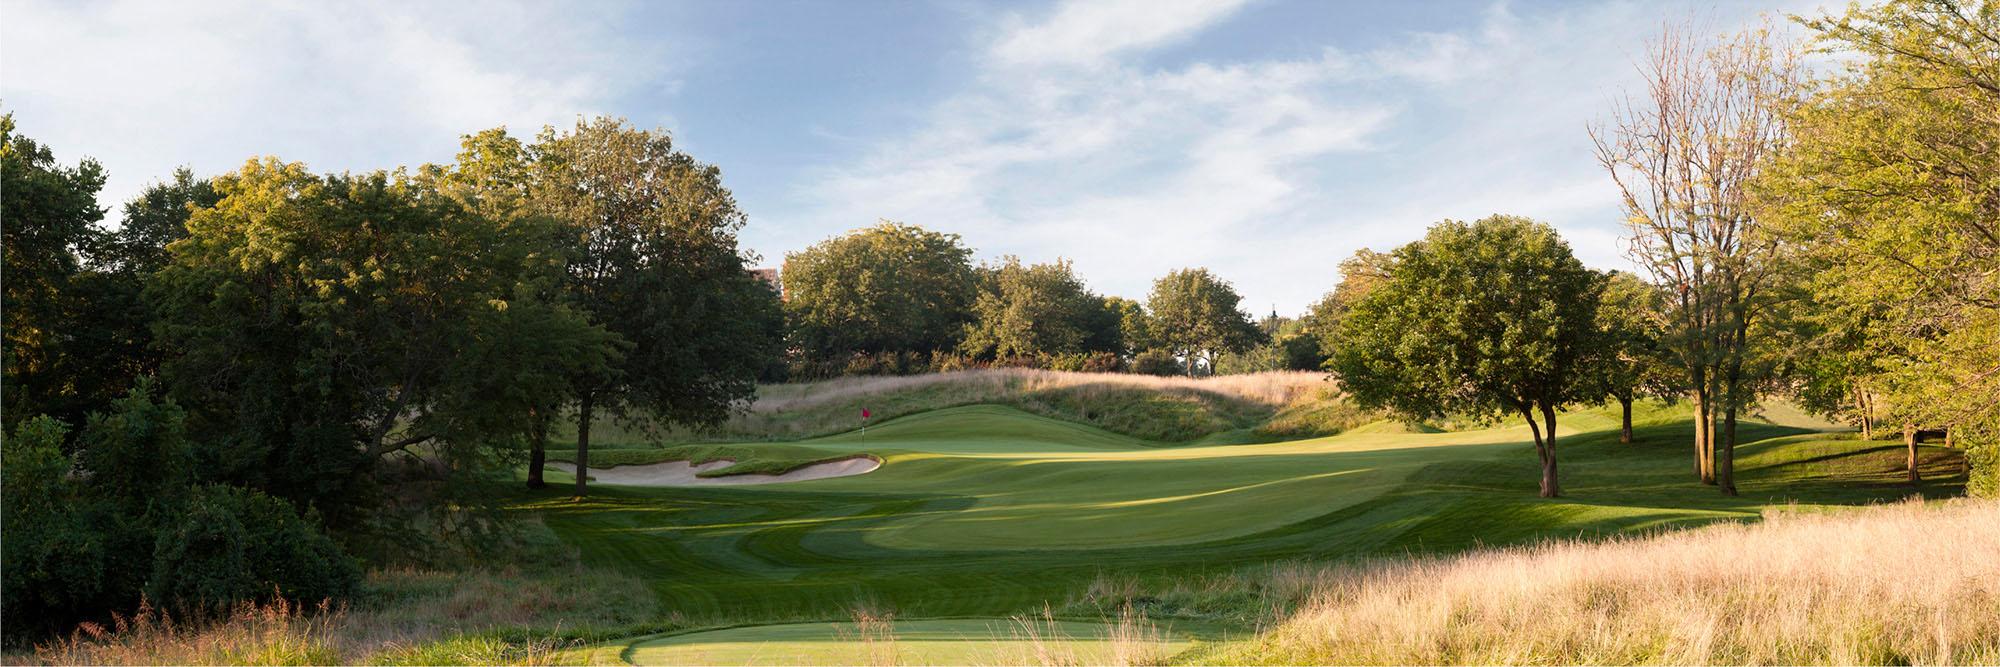 Golf Course Image - Hallbrook No. 2